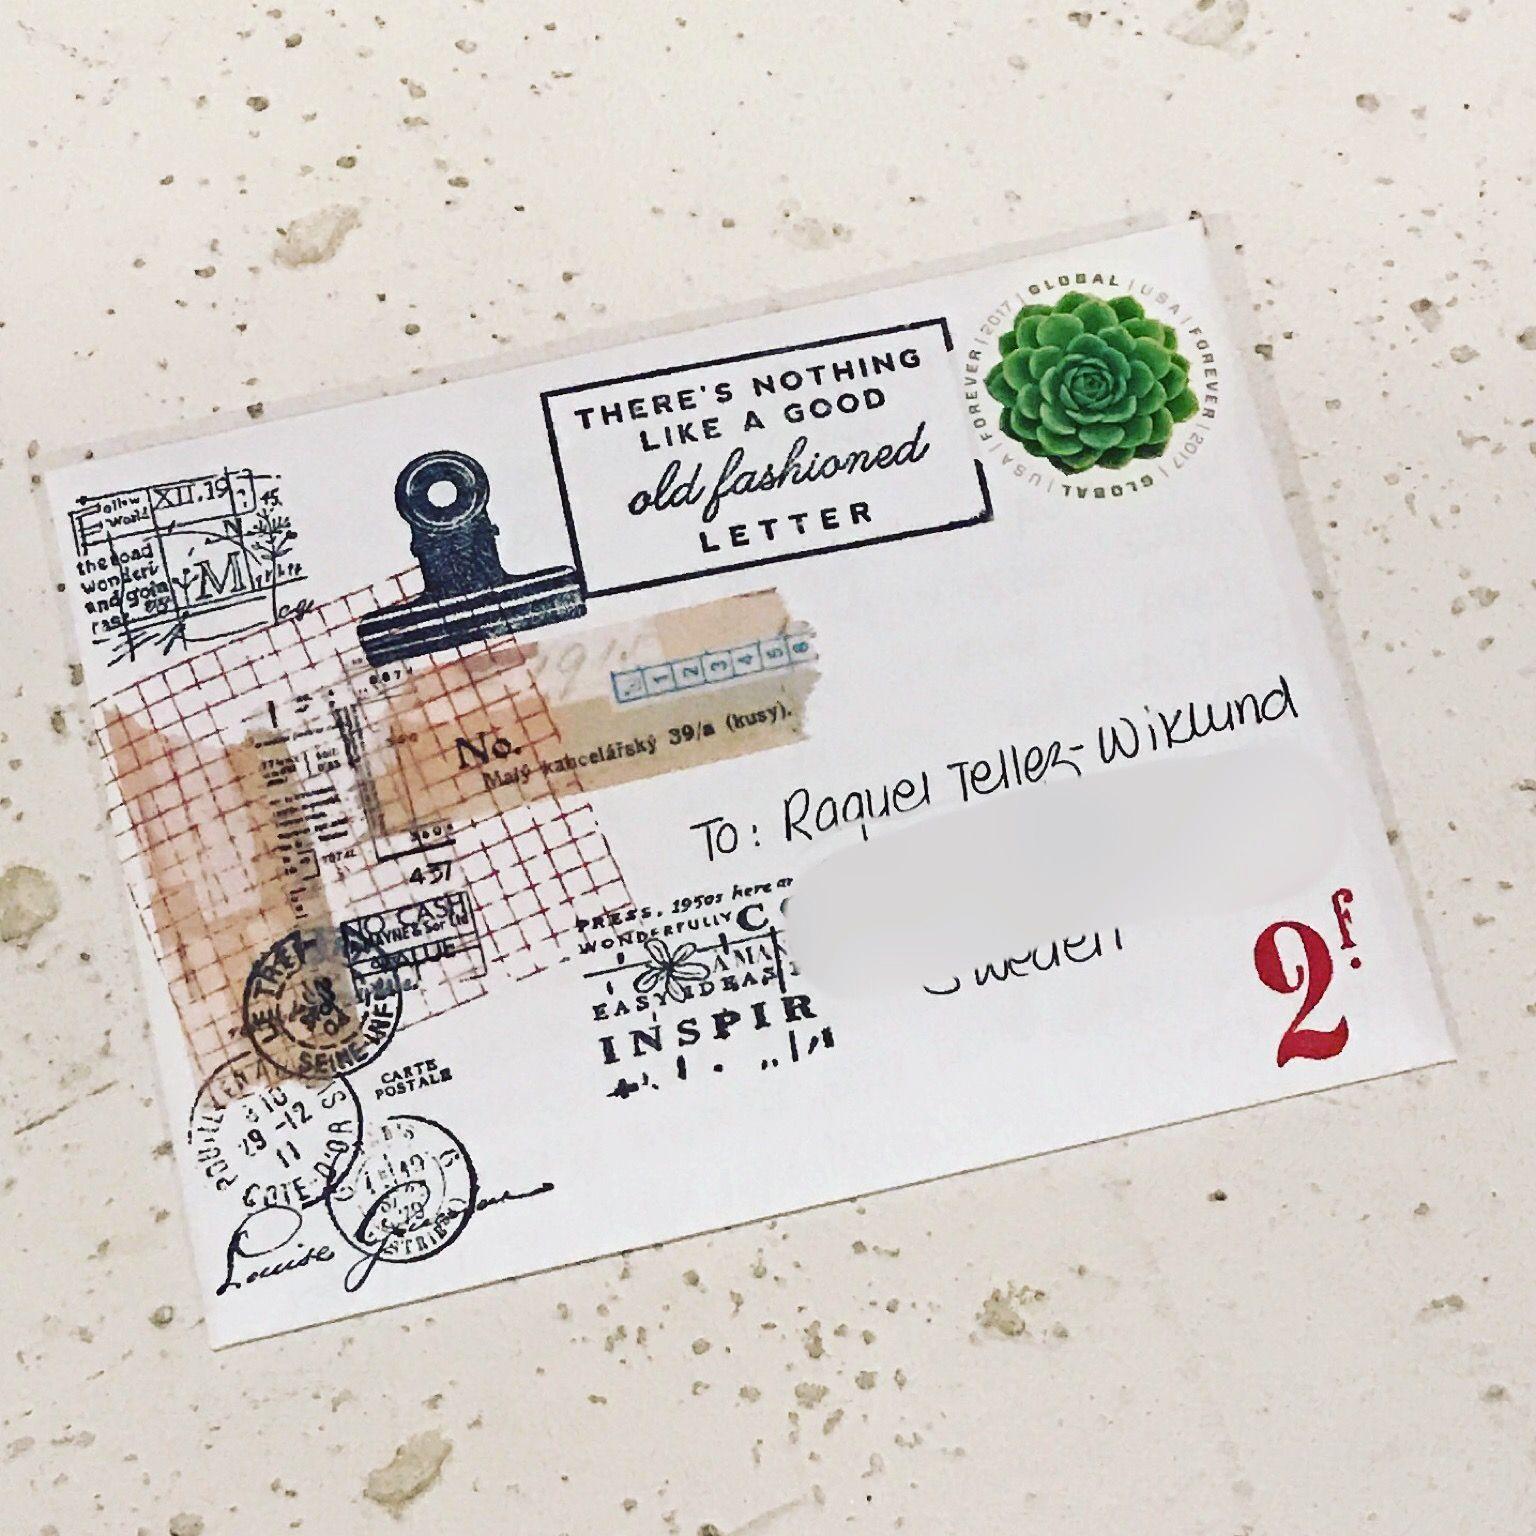 #mailart #postalart #snailmail #letters